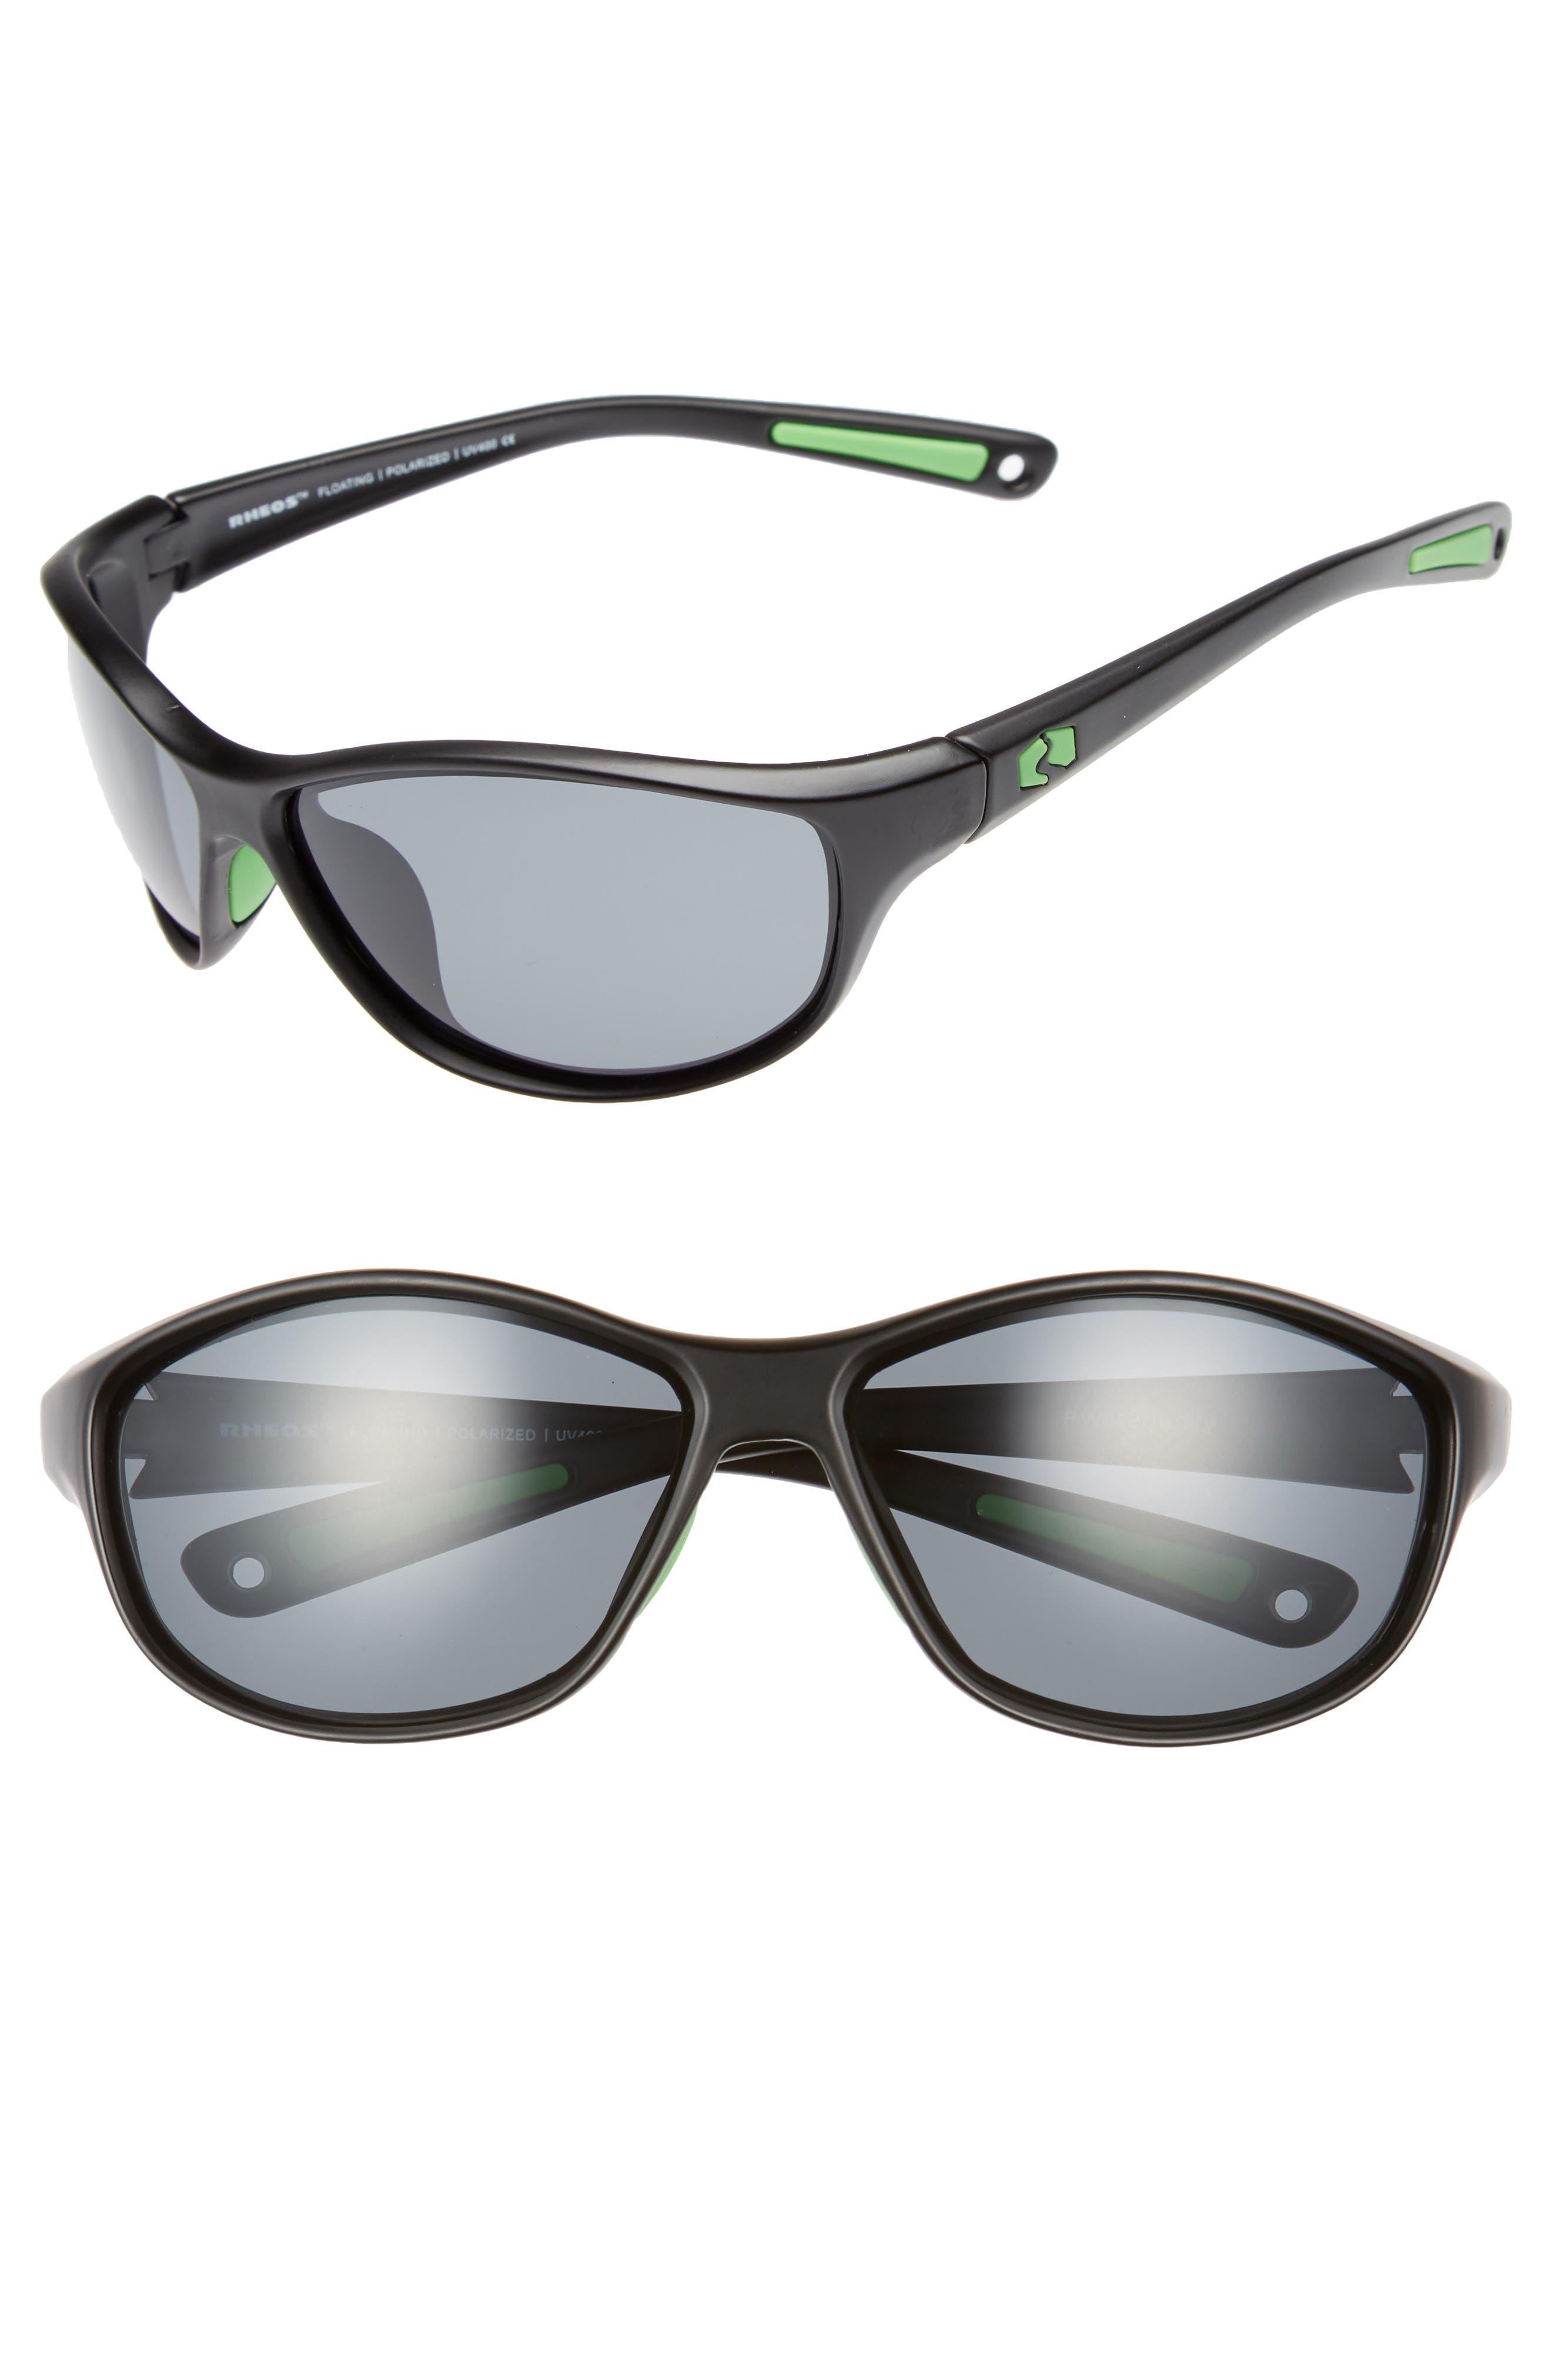 Bahias Floating 60mm Polarized Sunglasses,                             Main thumbnail 1, color,                             GUNMETAL / GUNMETAL